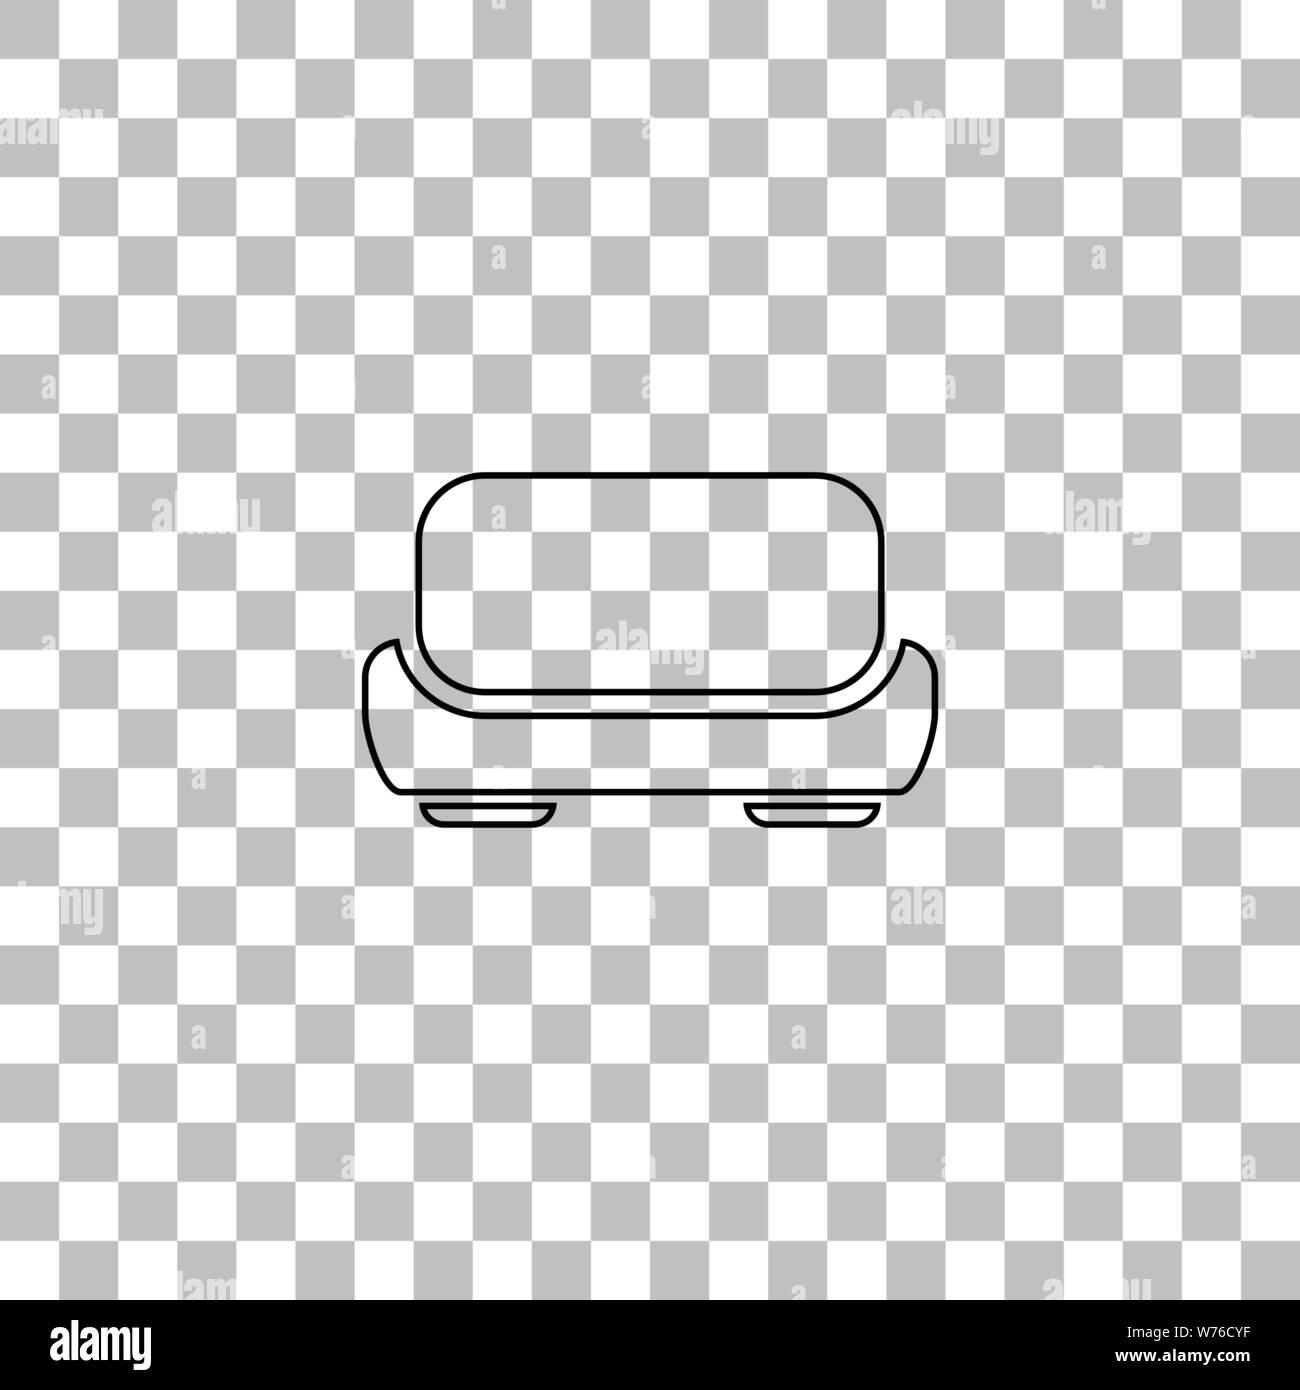 Peachy Sofa Black Flat Icon On A Transparent Background Pictogram Theyellowbook Wood Chair Design Ideas Theyellowbookinfo